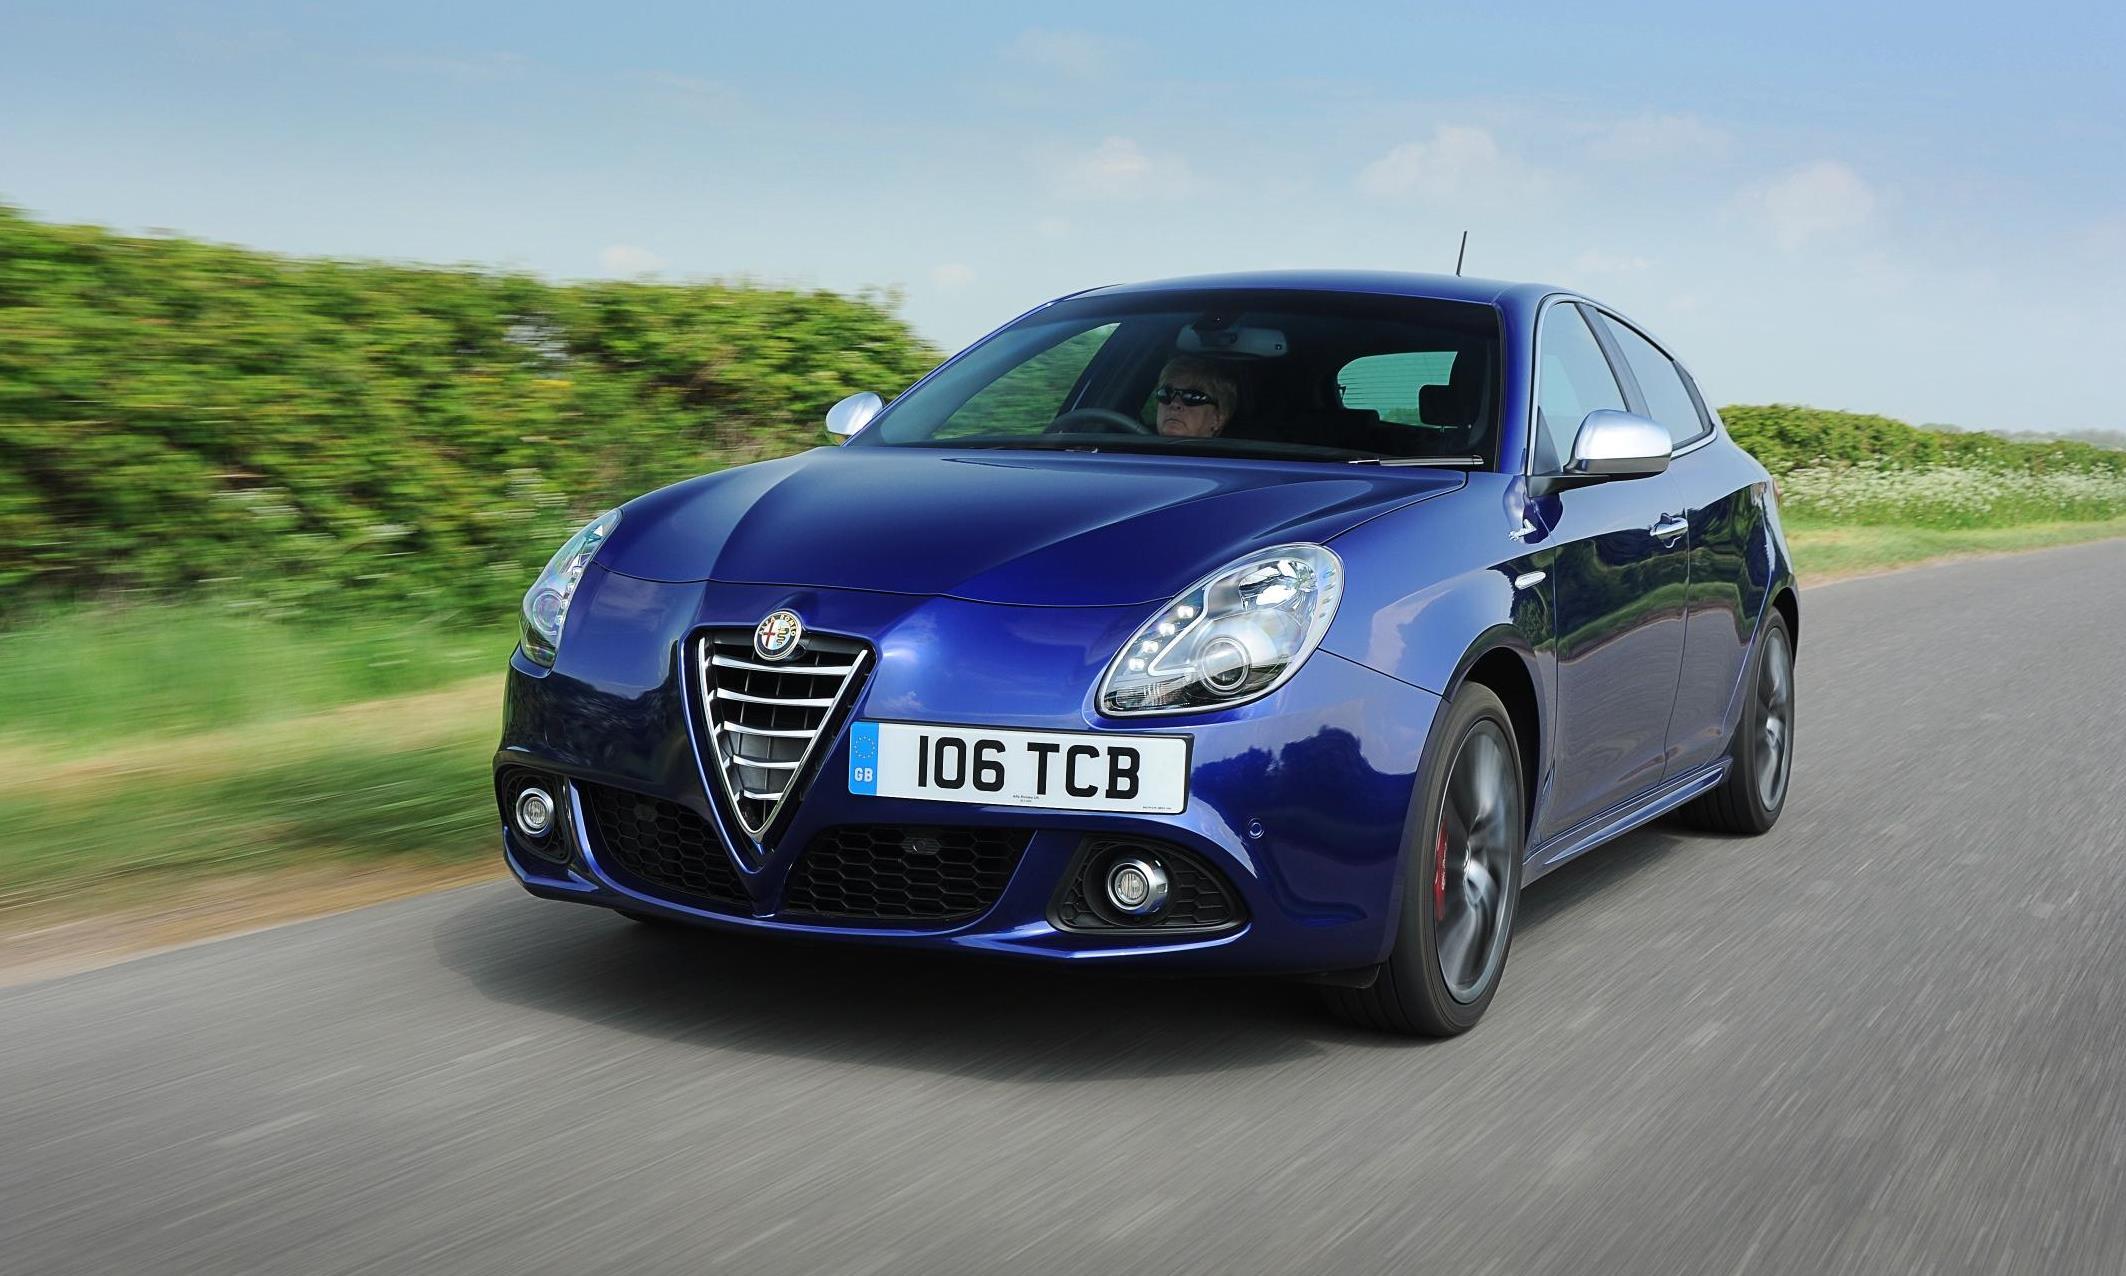 Alfa Romeo Giulietta 1.4 MultiAir Distinctive TCT